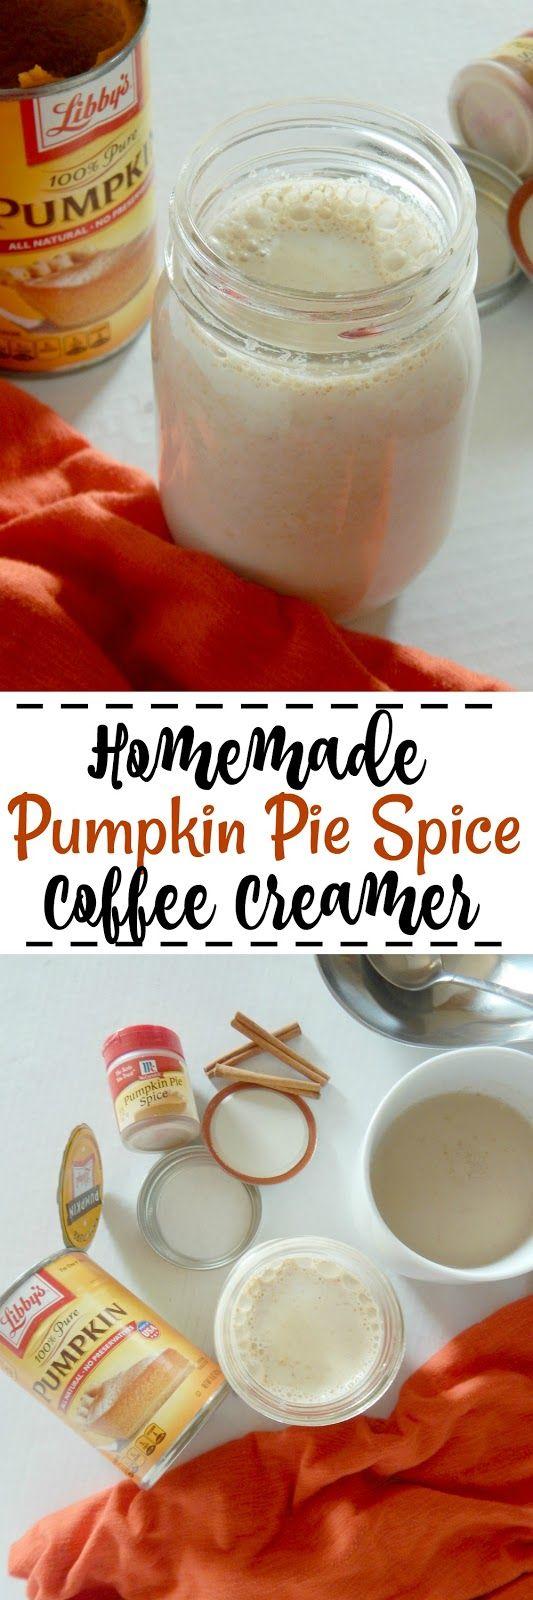 Homemade Pumpkin Pie Spice Coffee Creamer...a deli…